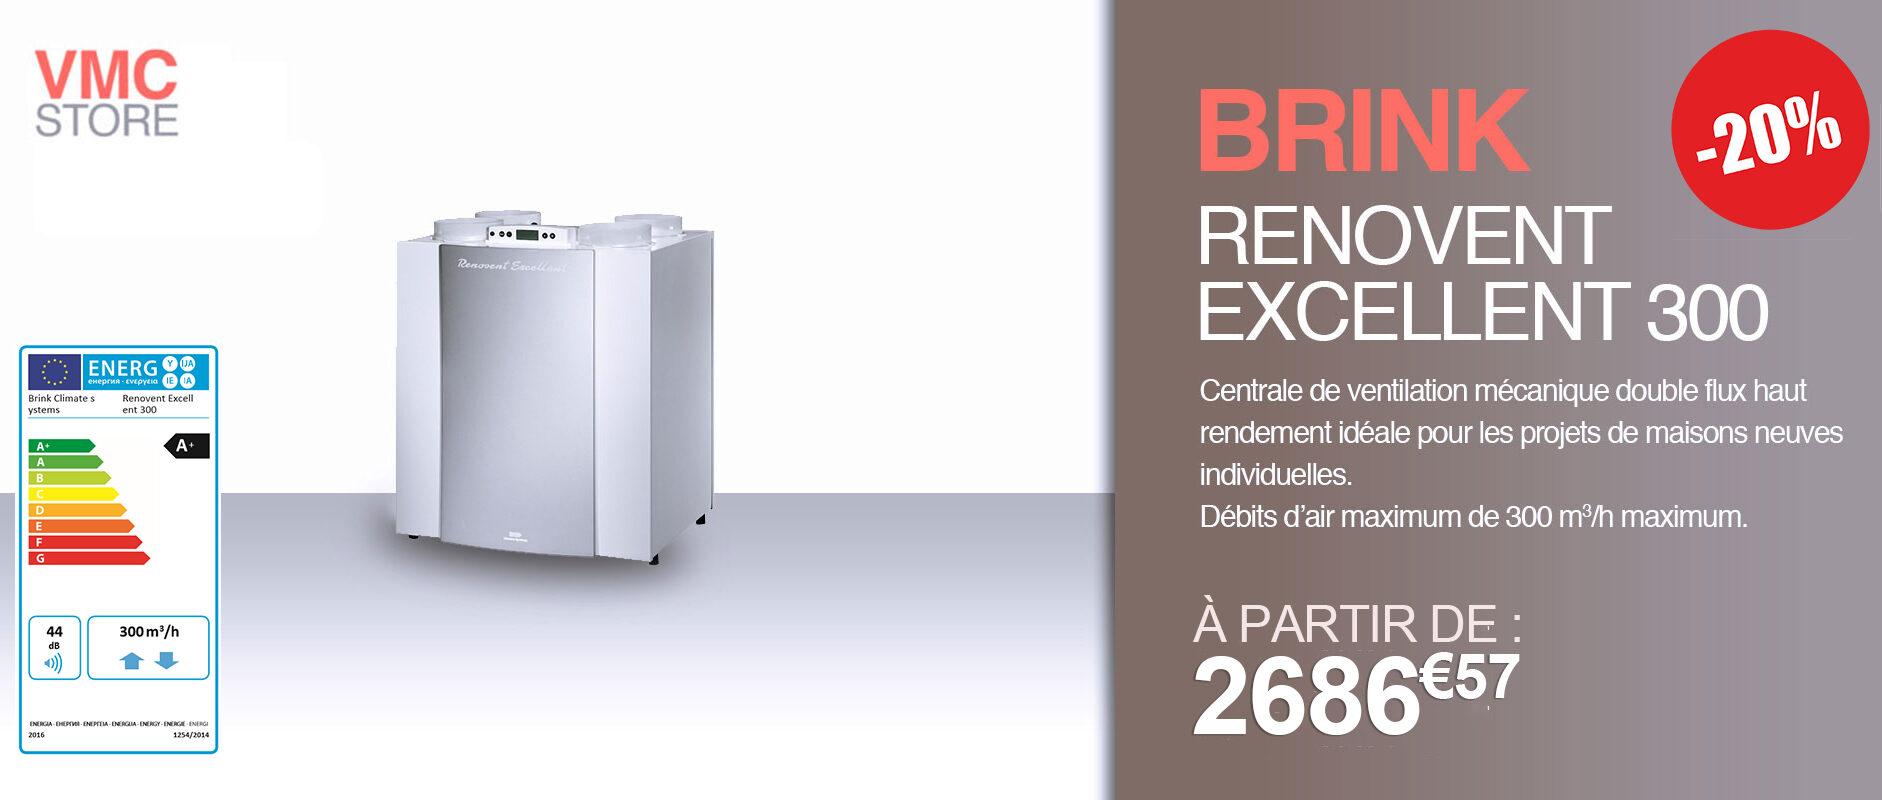 VMC DOUBLE FLUX RENOVENT EXCELLENT 300 BRINK